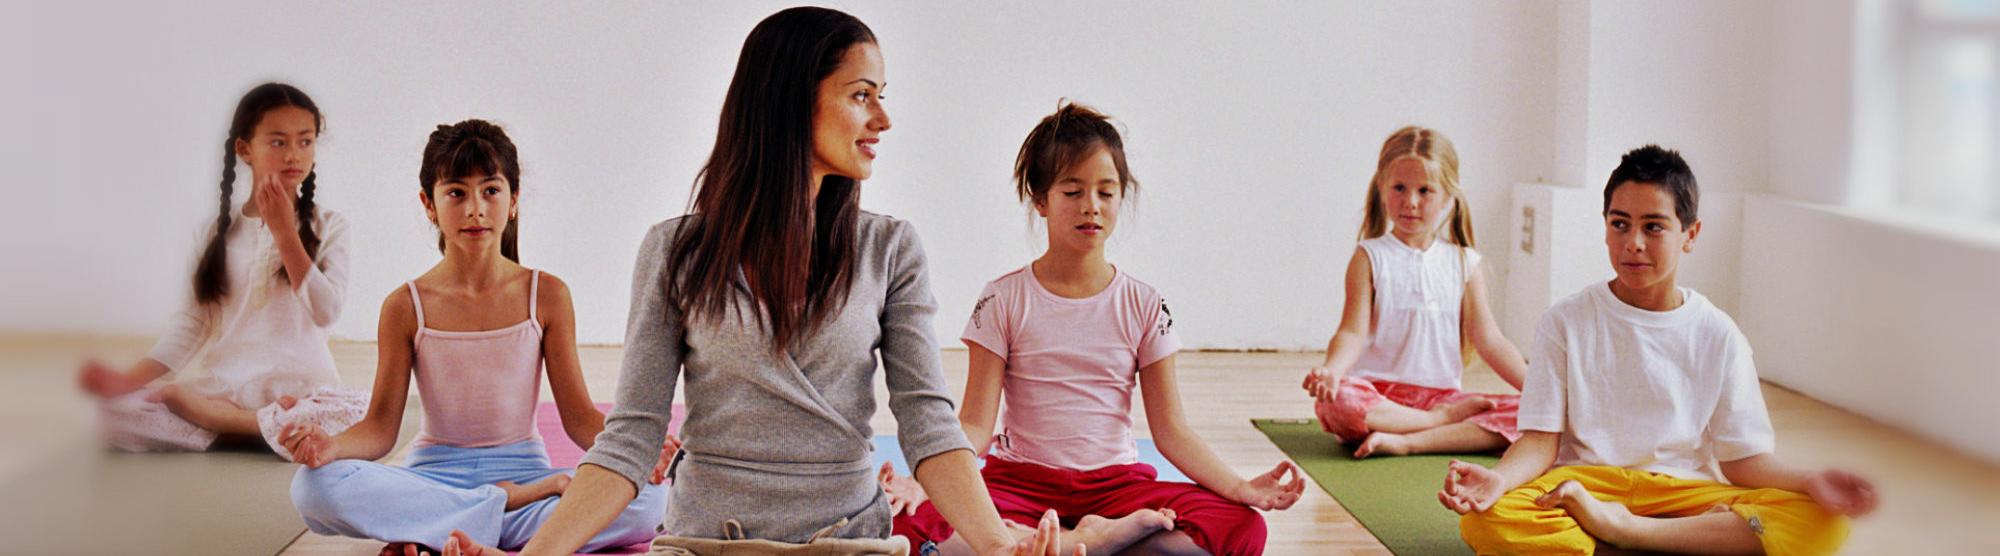 йога для детей, Твоя Студія